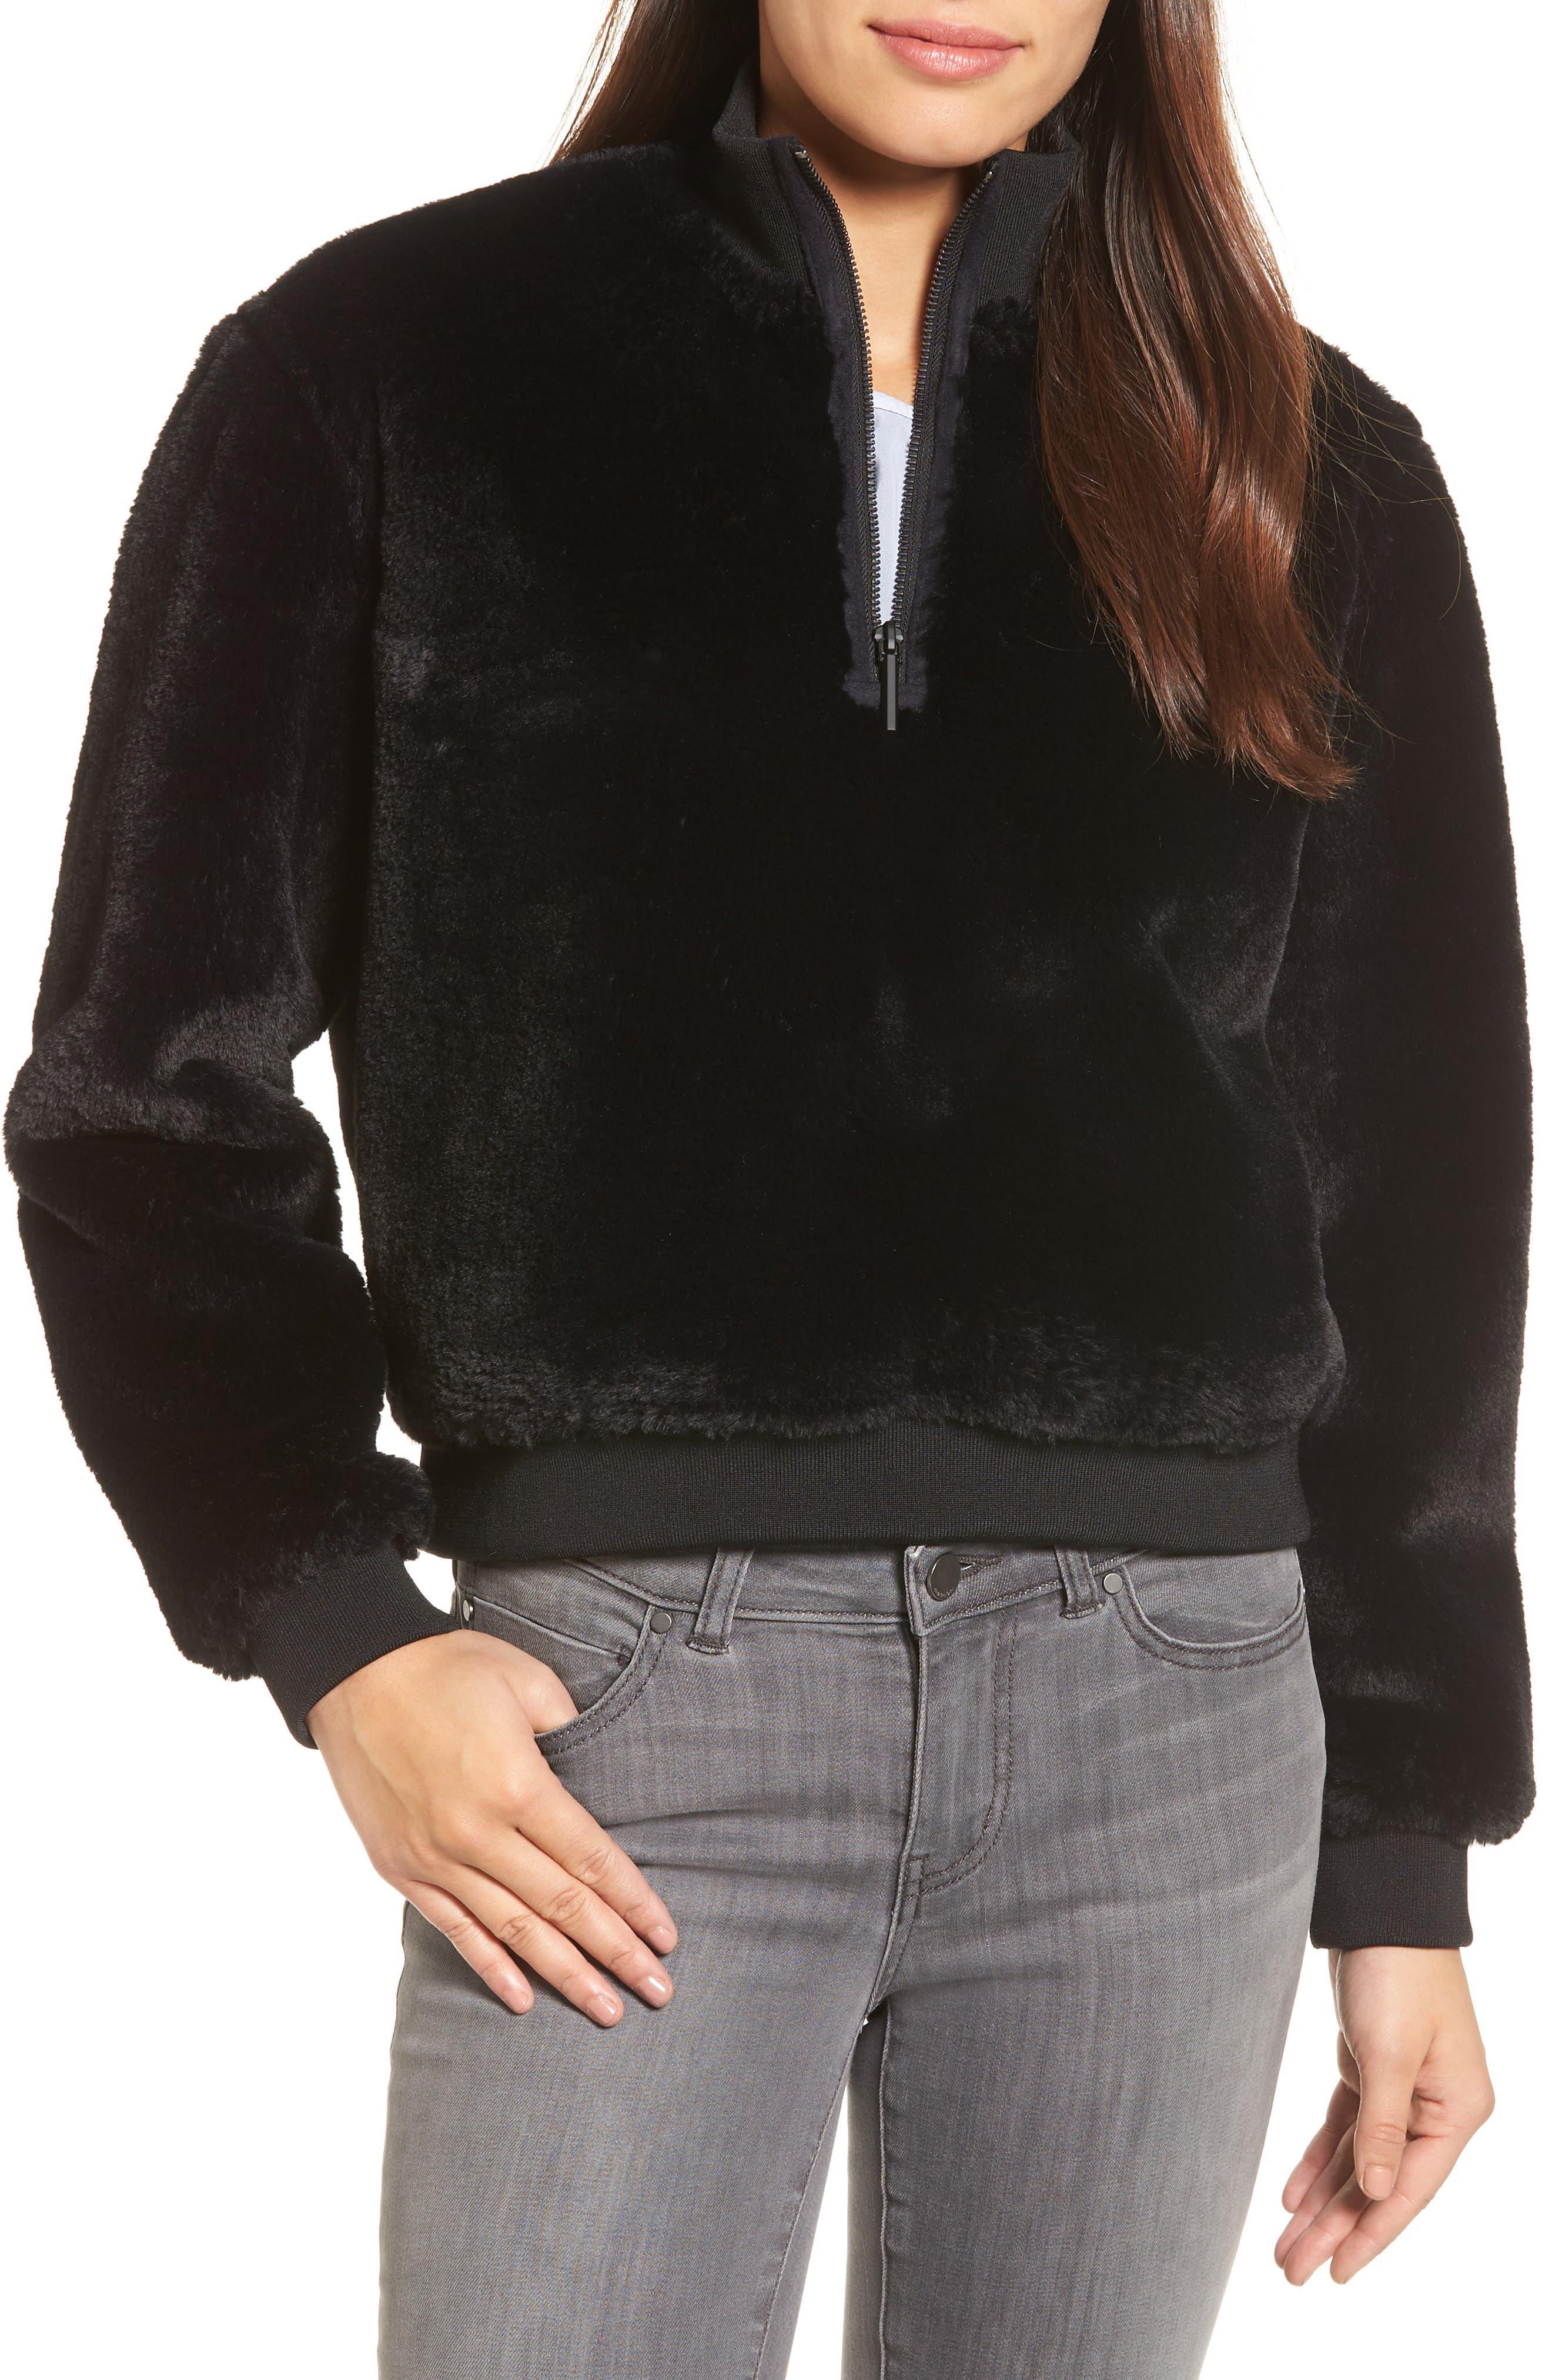 KENNETH COLE NEW YORK Half-Zip Faux Fur Sweatshirt, Main, color, BLACK